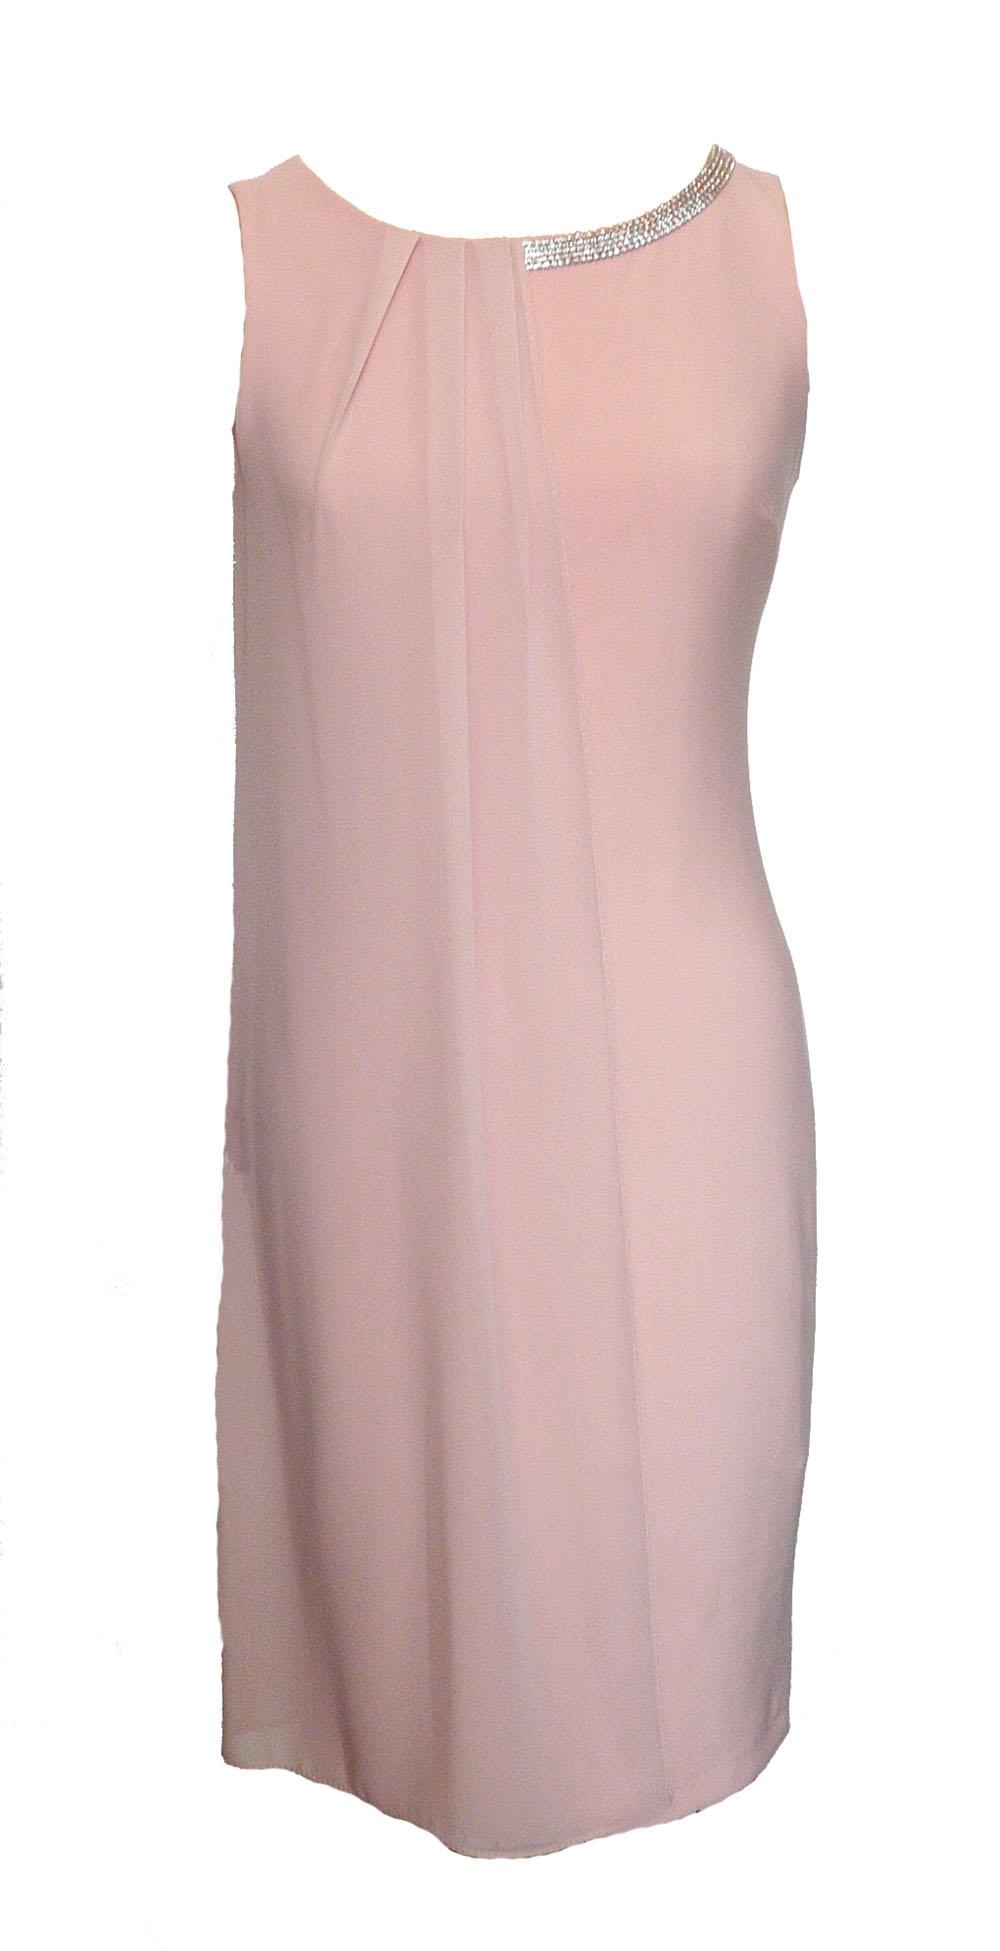 dress pnk chiffon.jpg